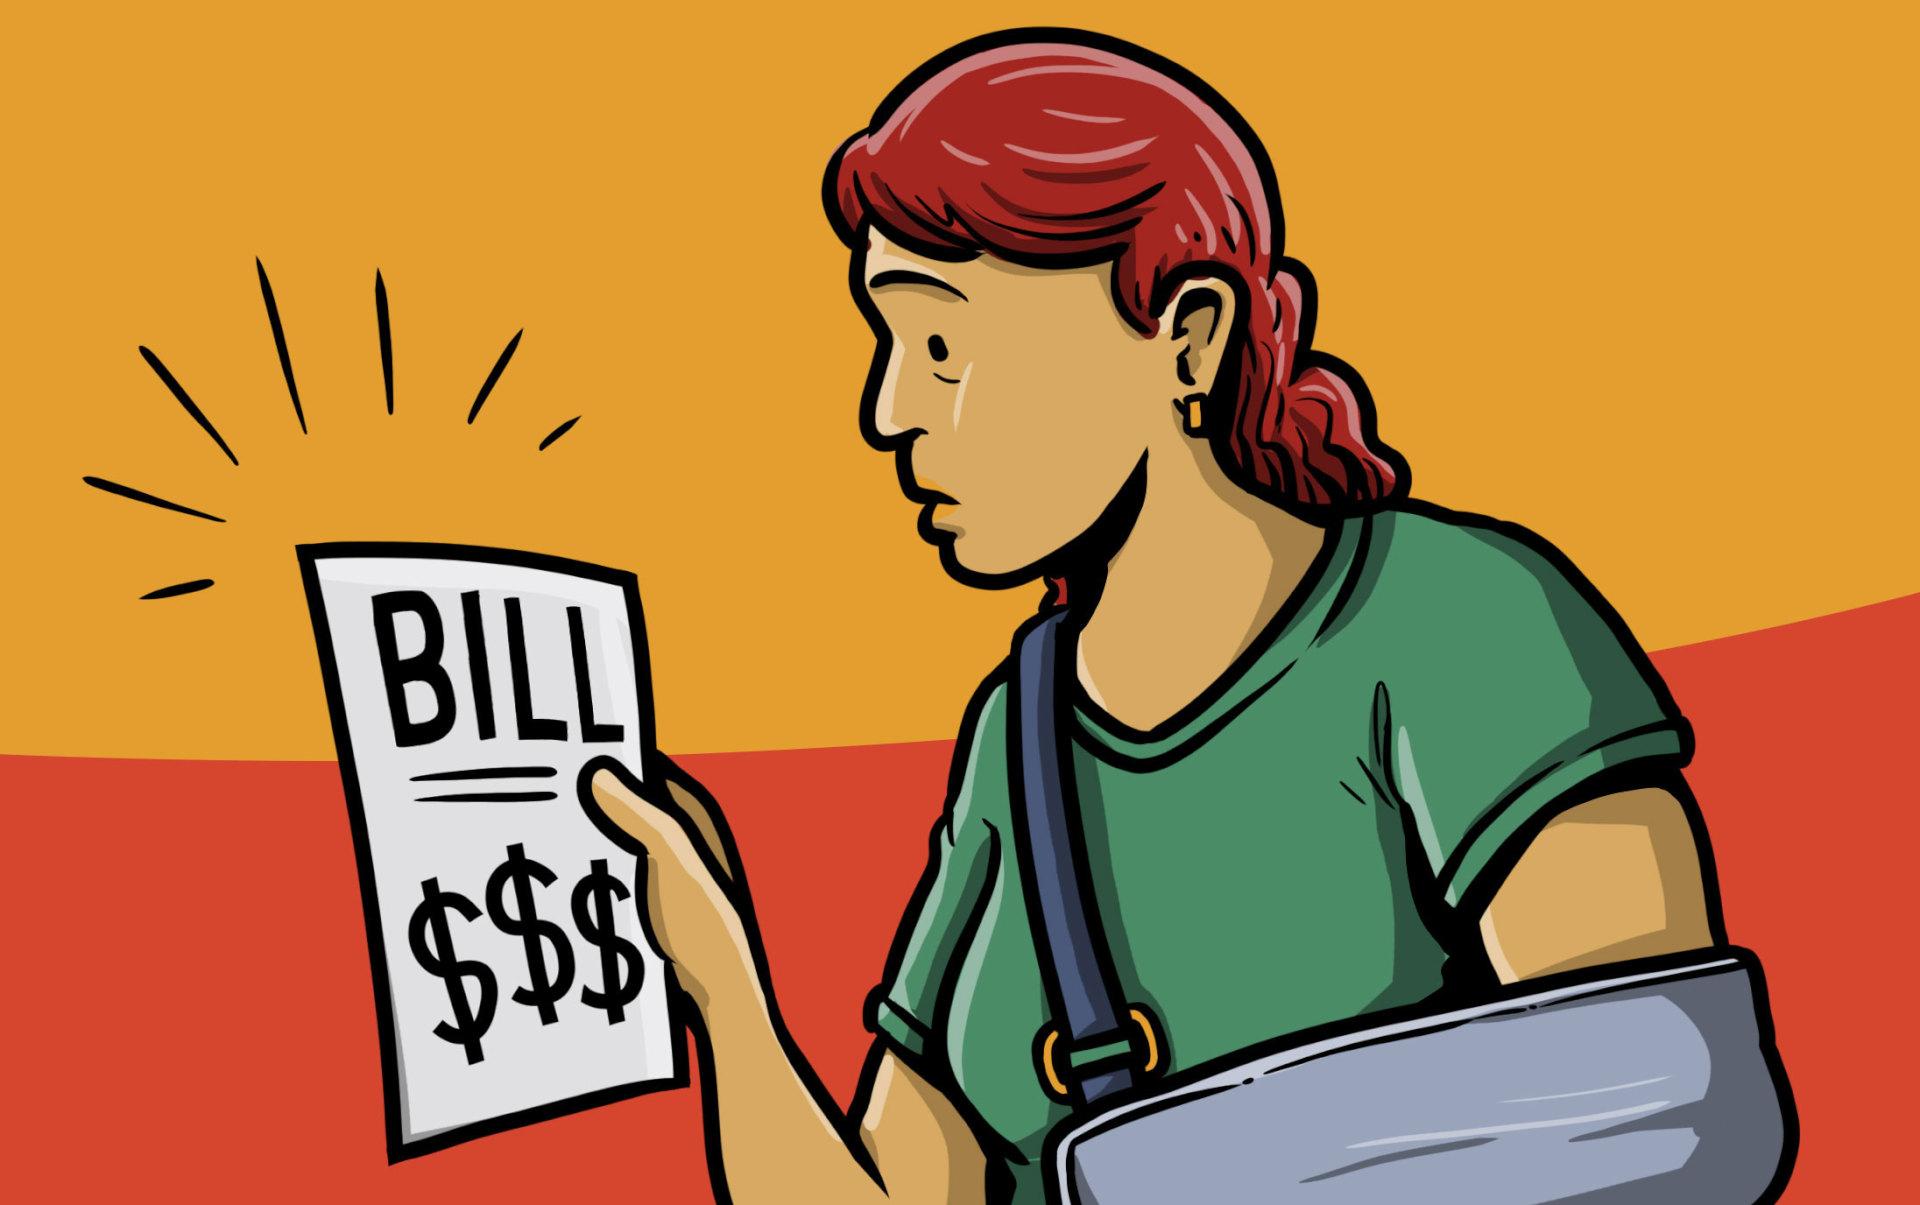 Update lawmakers pass measure. Bill clipart hospital bill